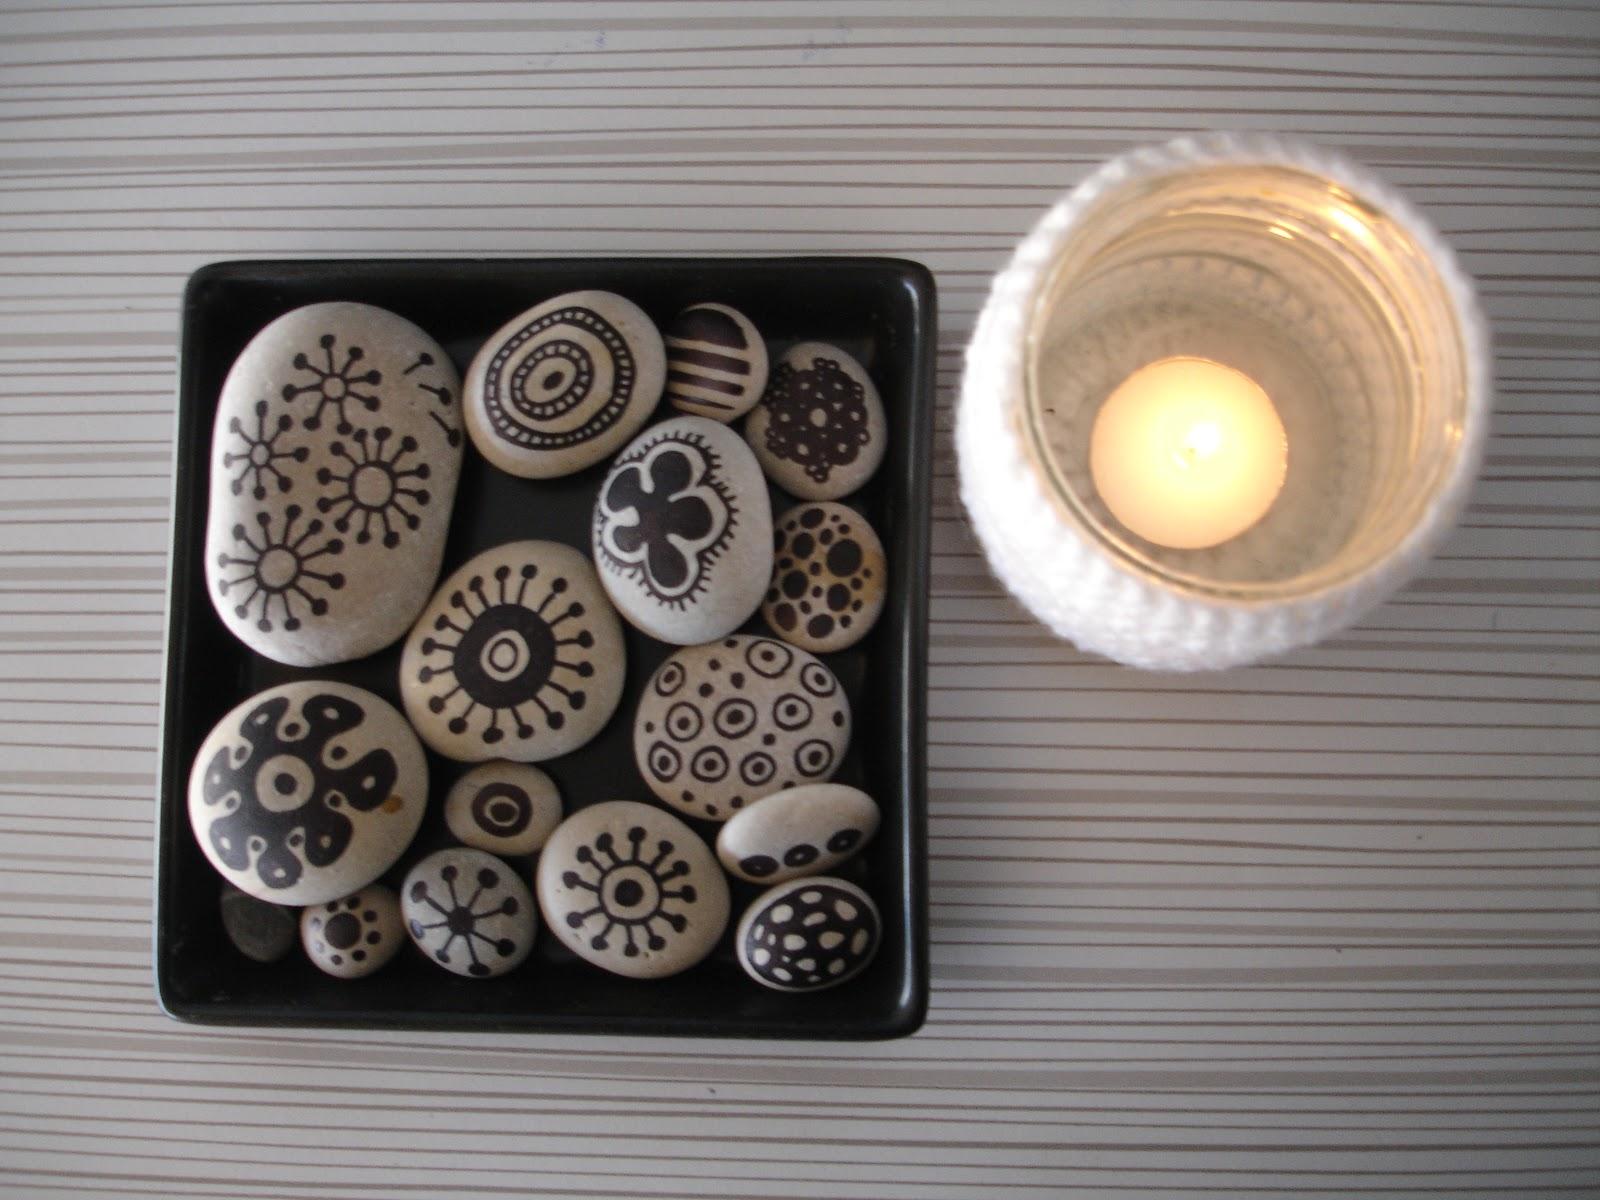 I o shop pedres pintades - Pintura para piedras ...